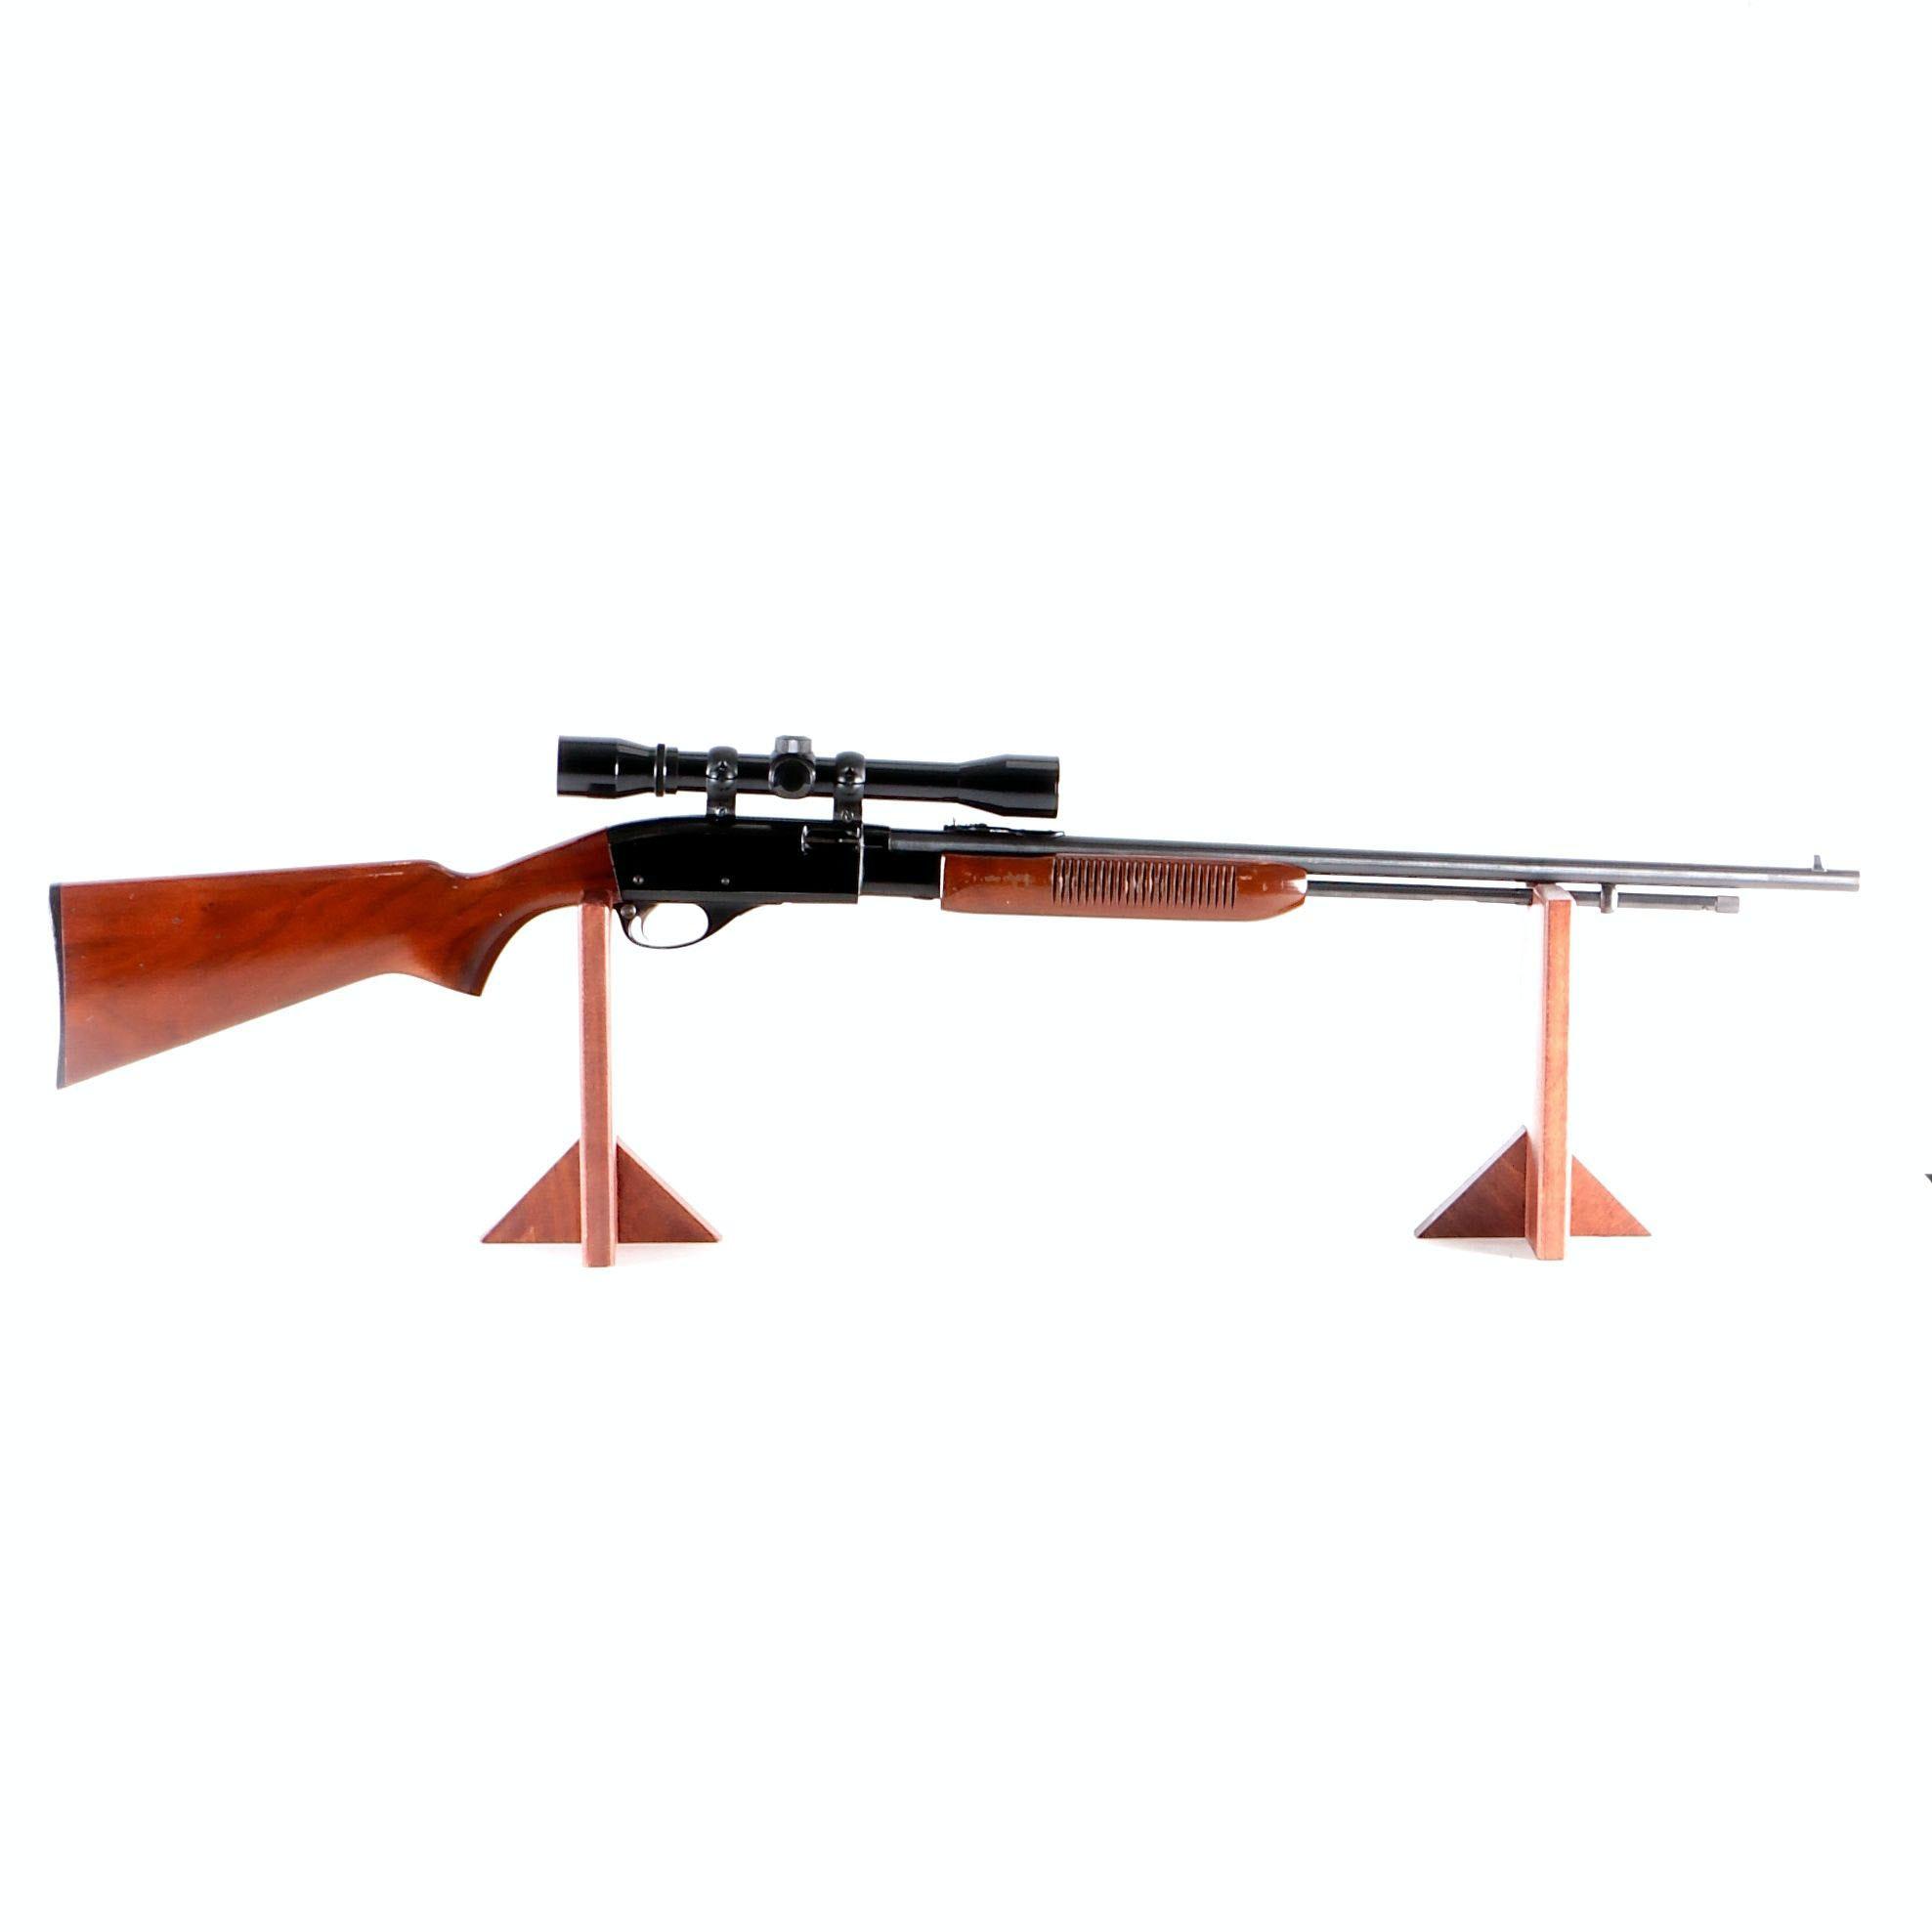 Remington Model 572 Fieldmaster 22 LR Rifle with Bushnell Sportview Scope